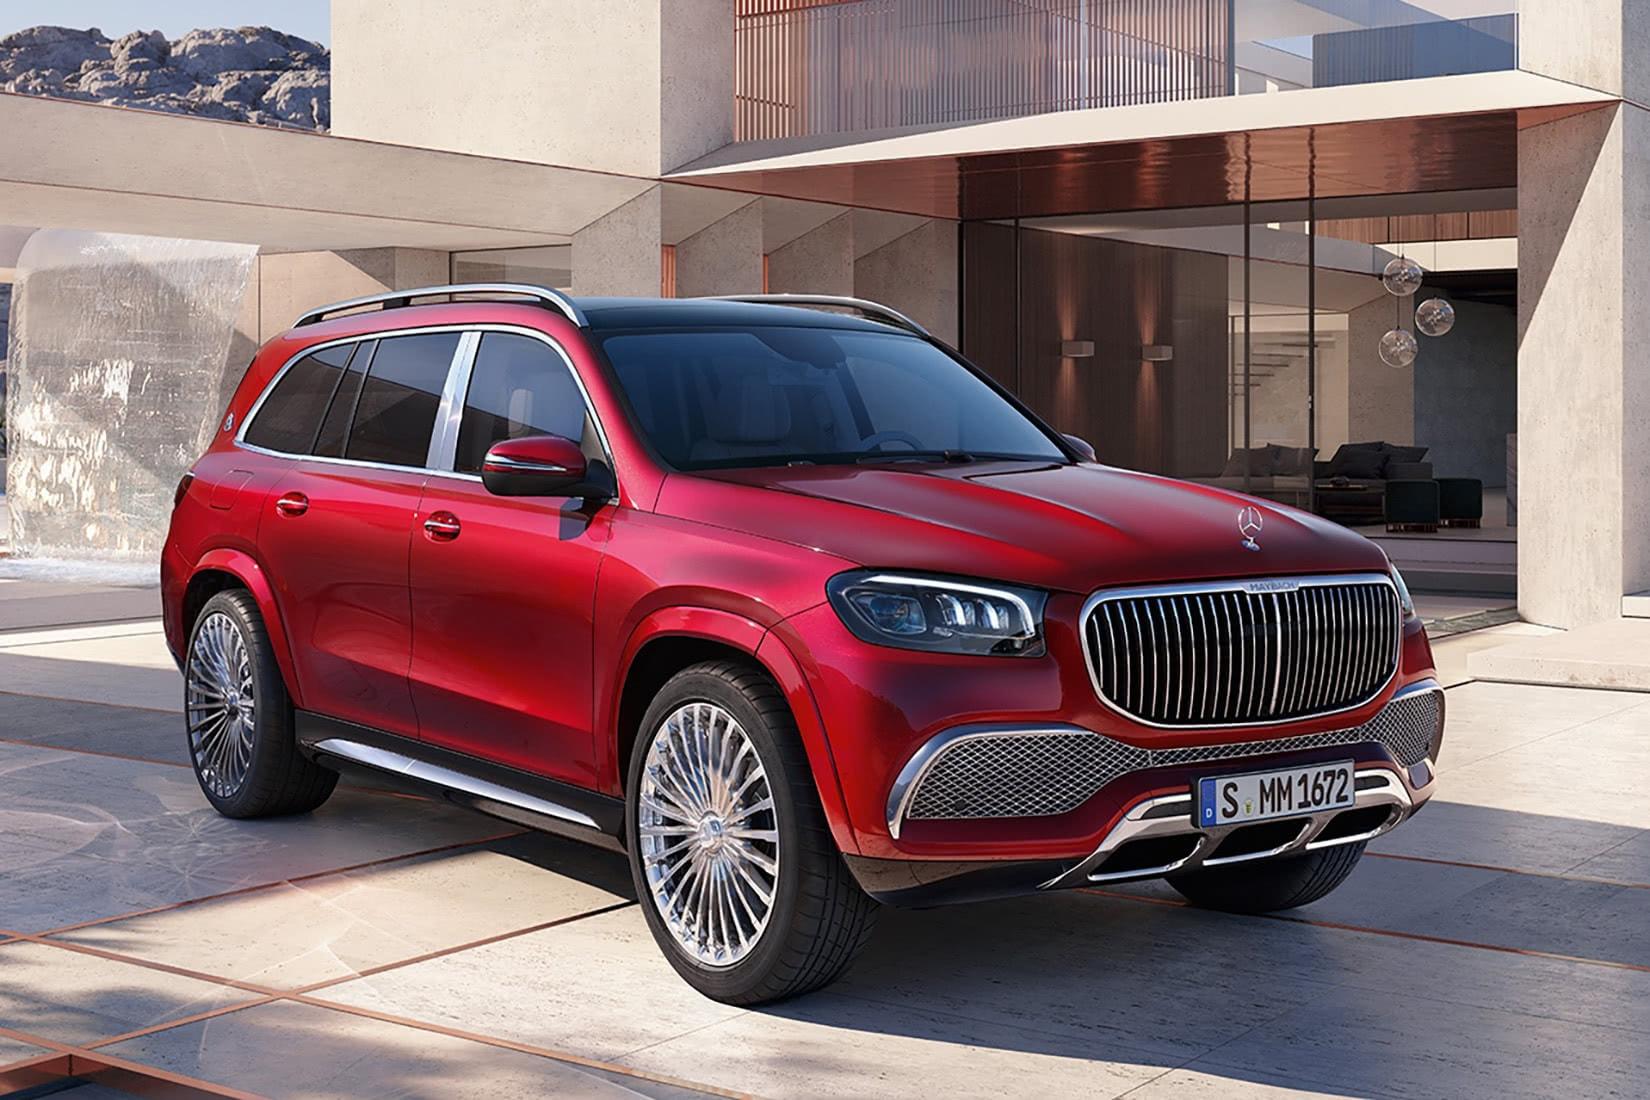 21 Best Luxury Suvs Top Rated Suvs Of 2021 Updated